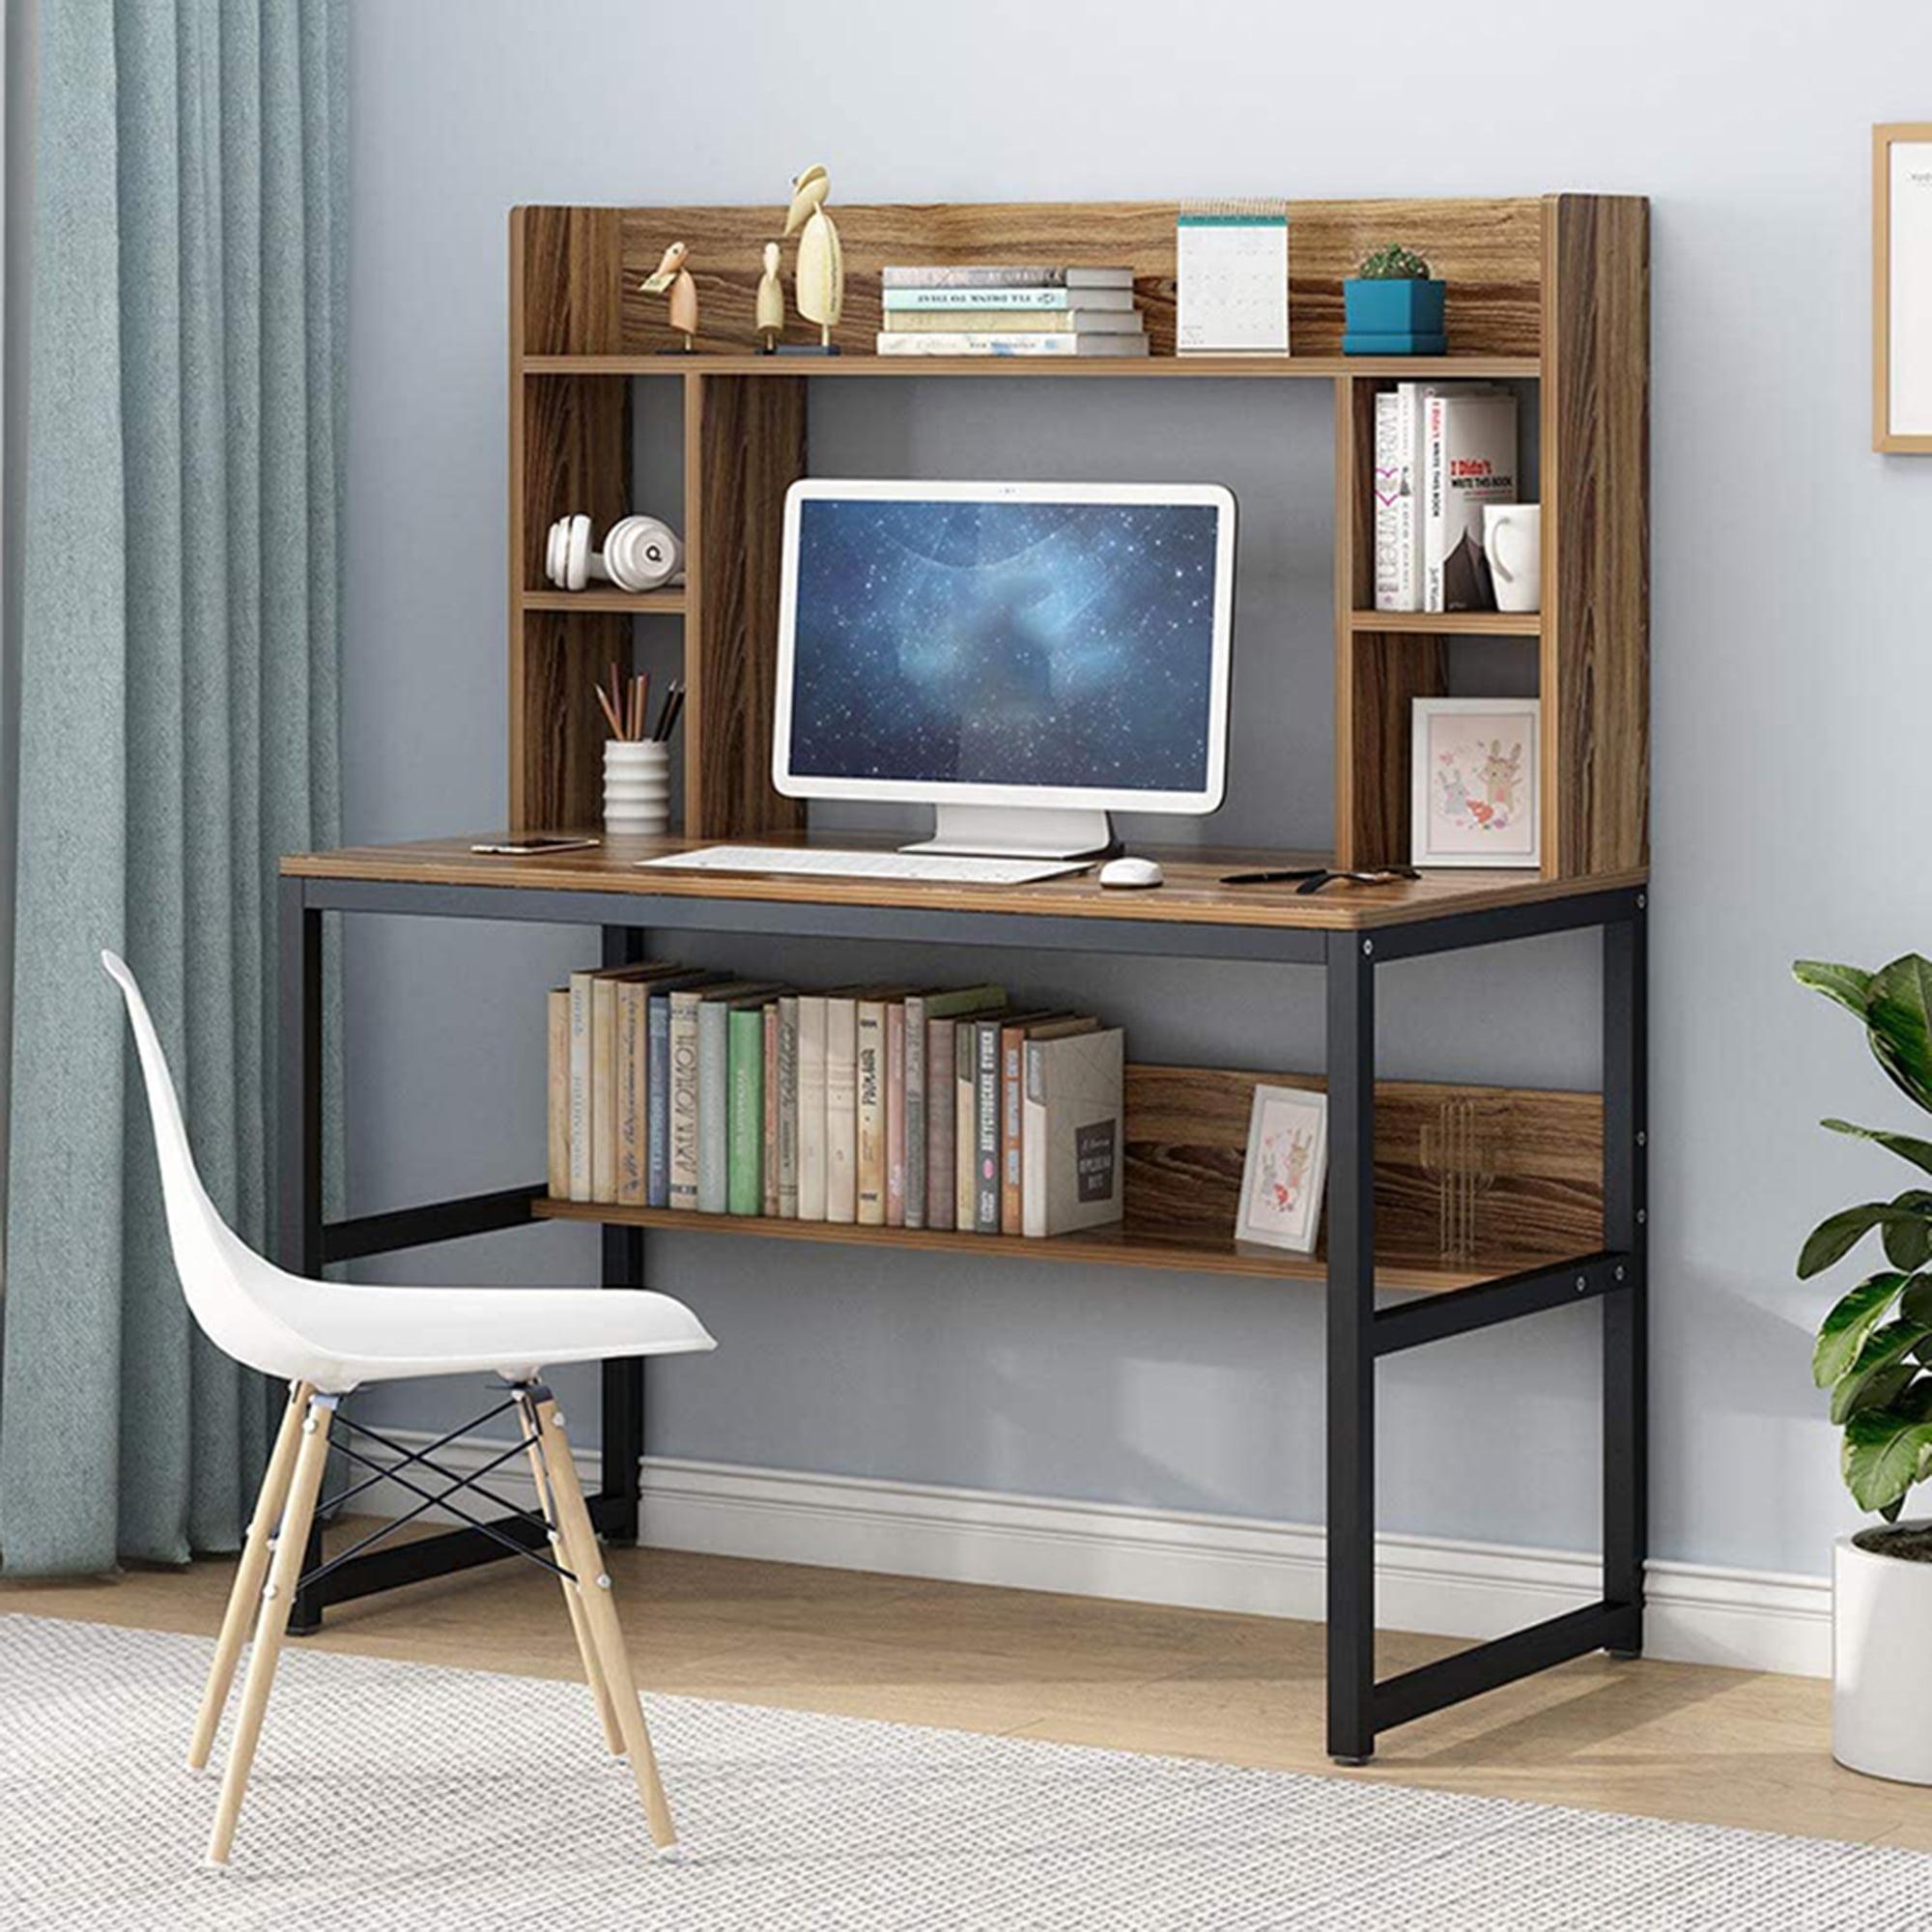 Computer Desk Home Office Desk PC Laptop Study Workstation Table w//Storage Shelf